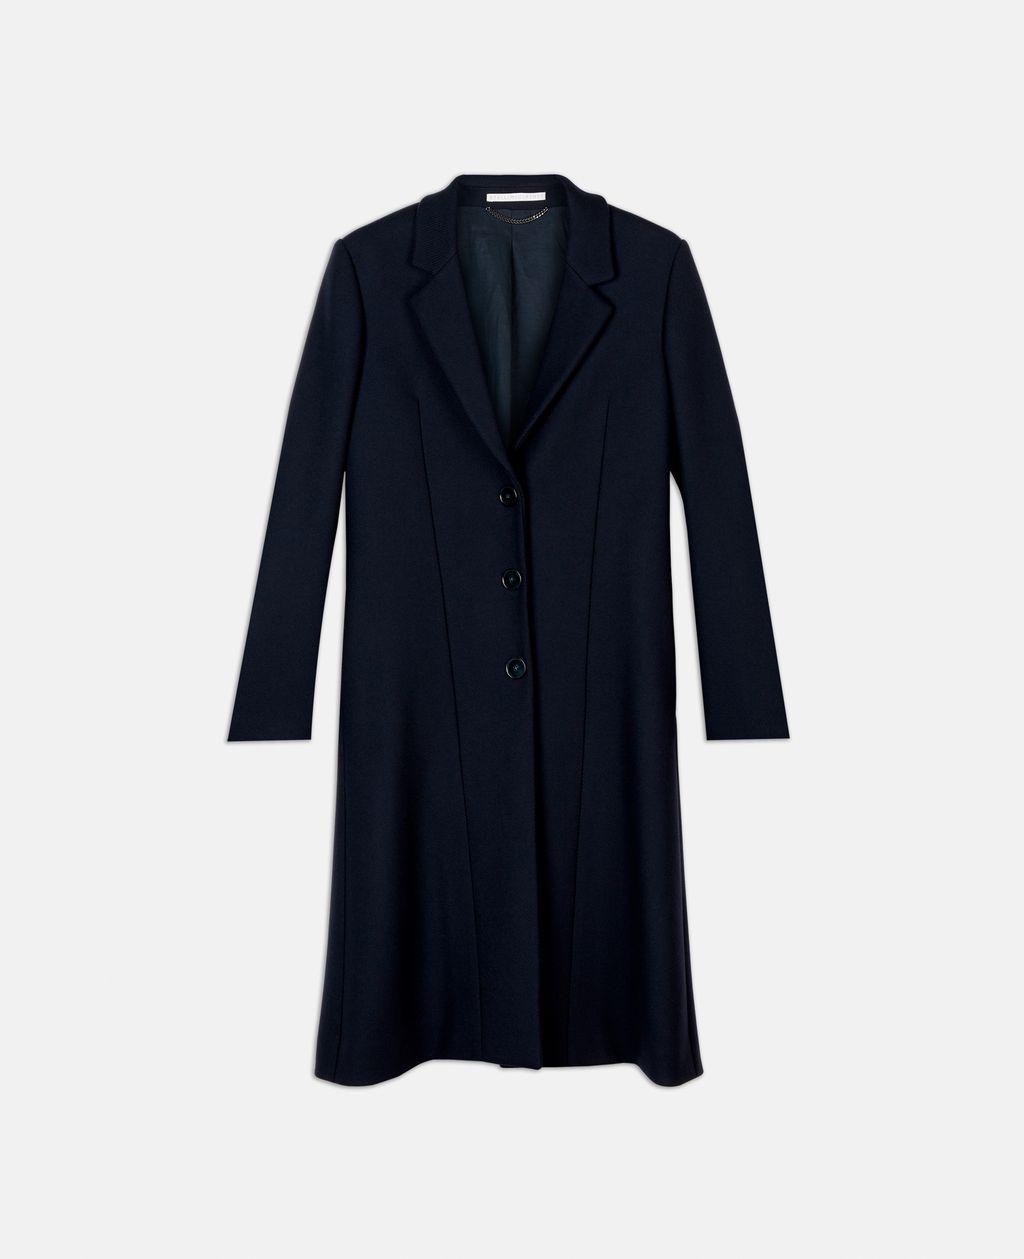 Women's Coats Jackets - Stella Mccartney - Fall Winter 17 18